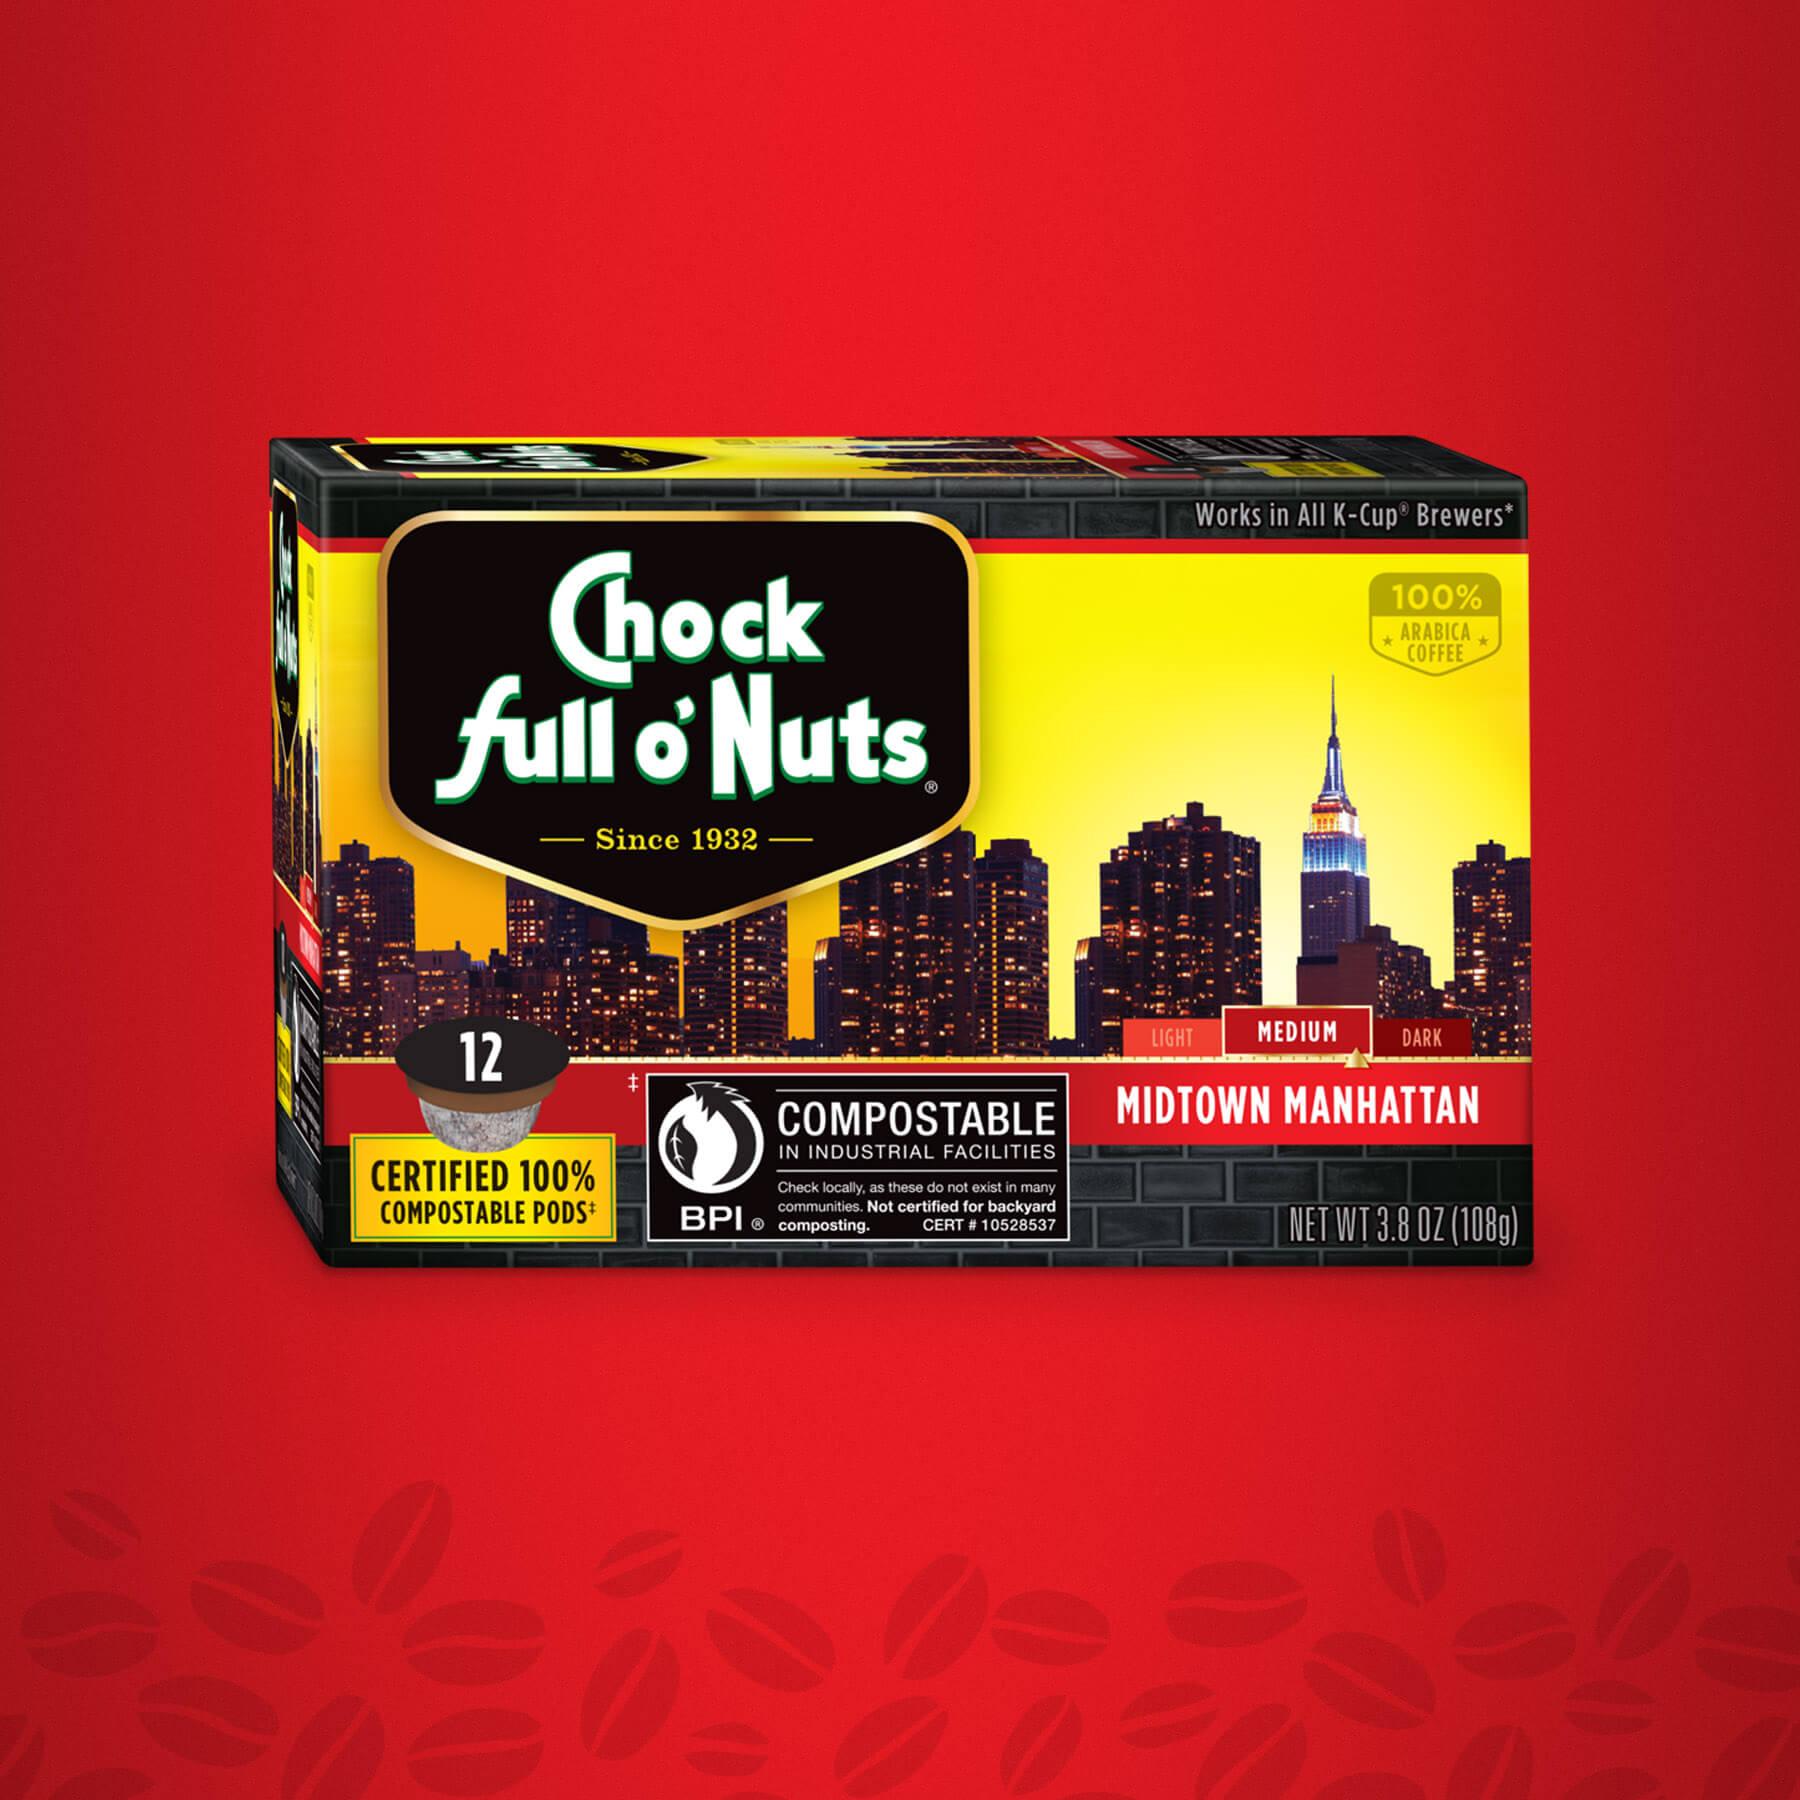 Chock full o' Nuts Midtown Manhattan Package Design